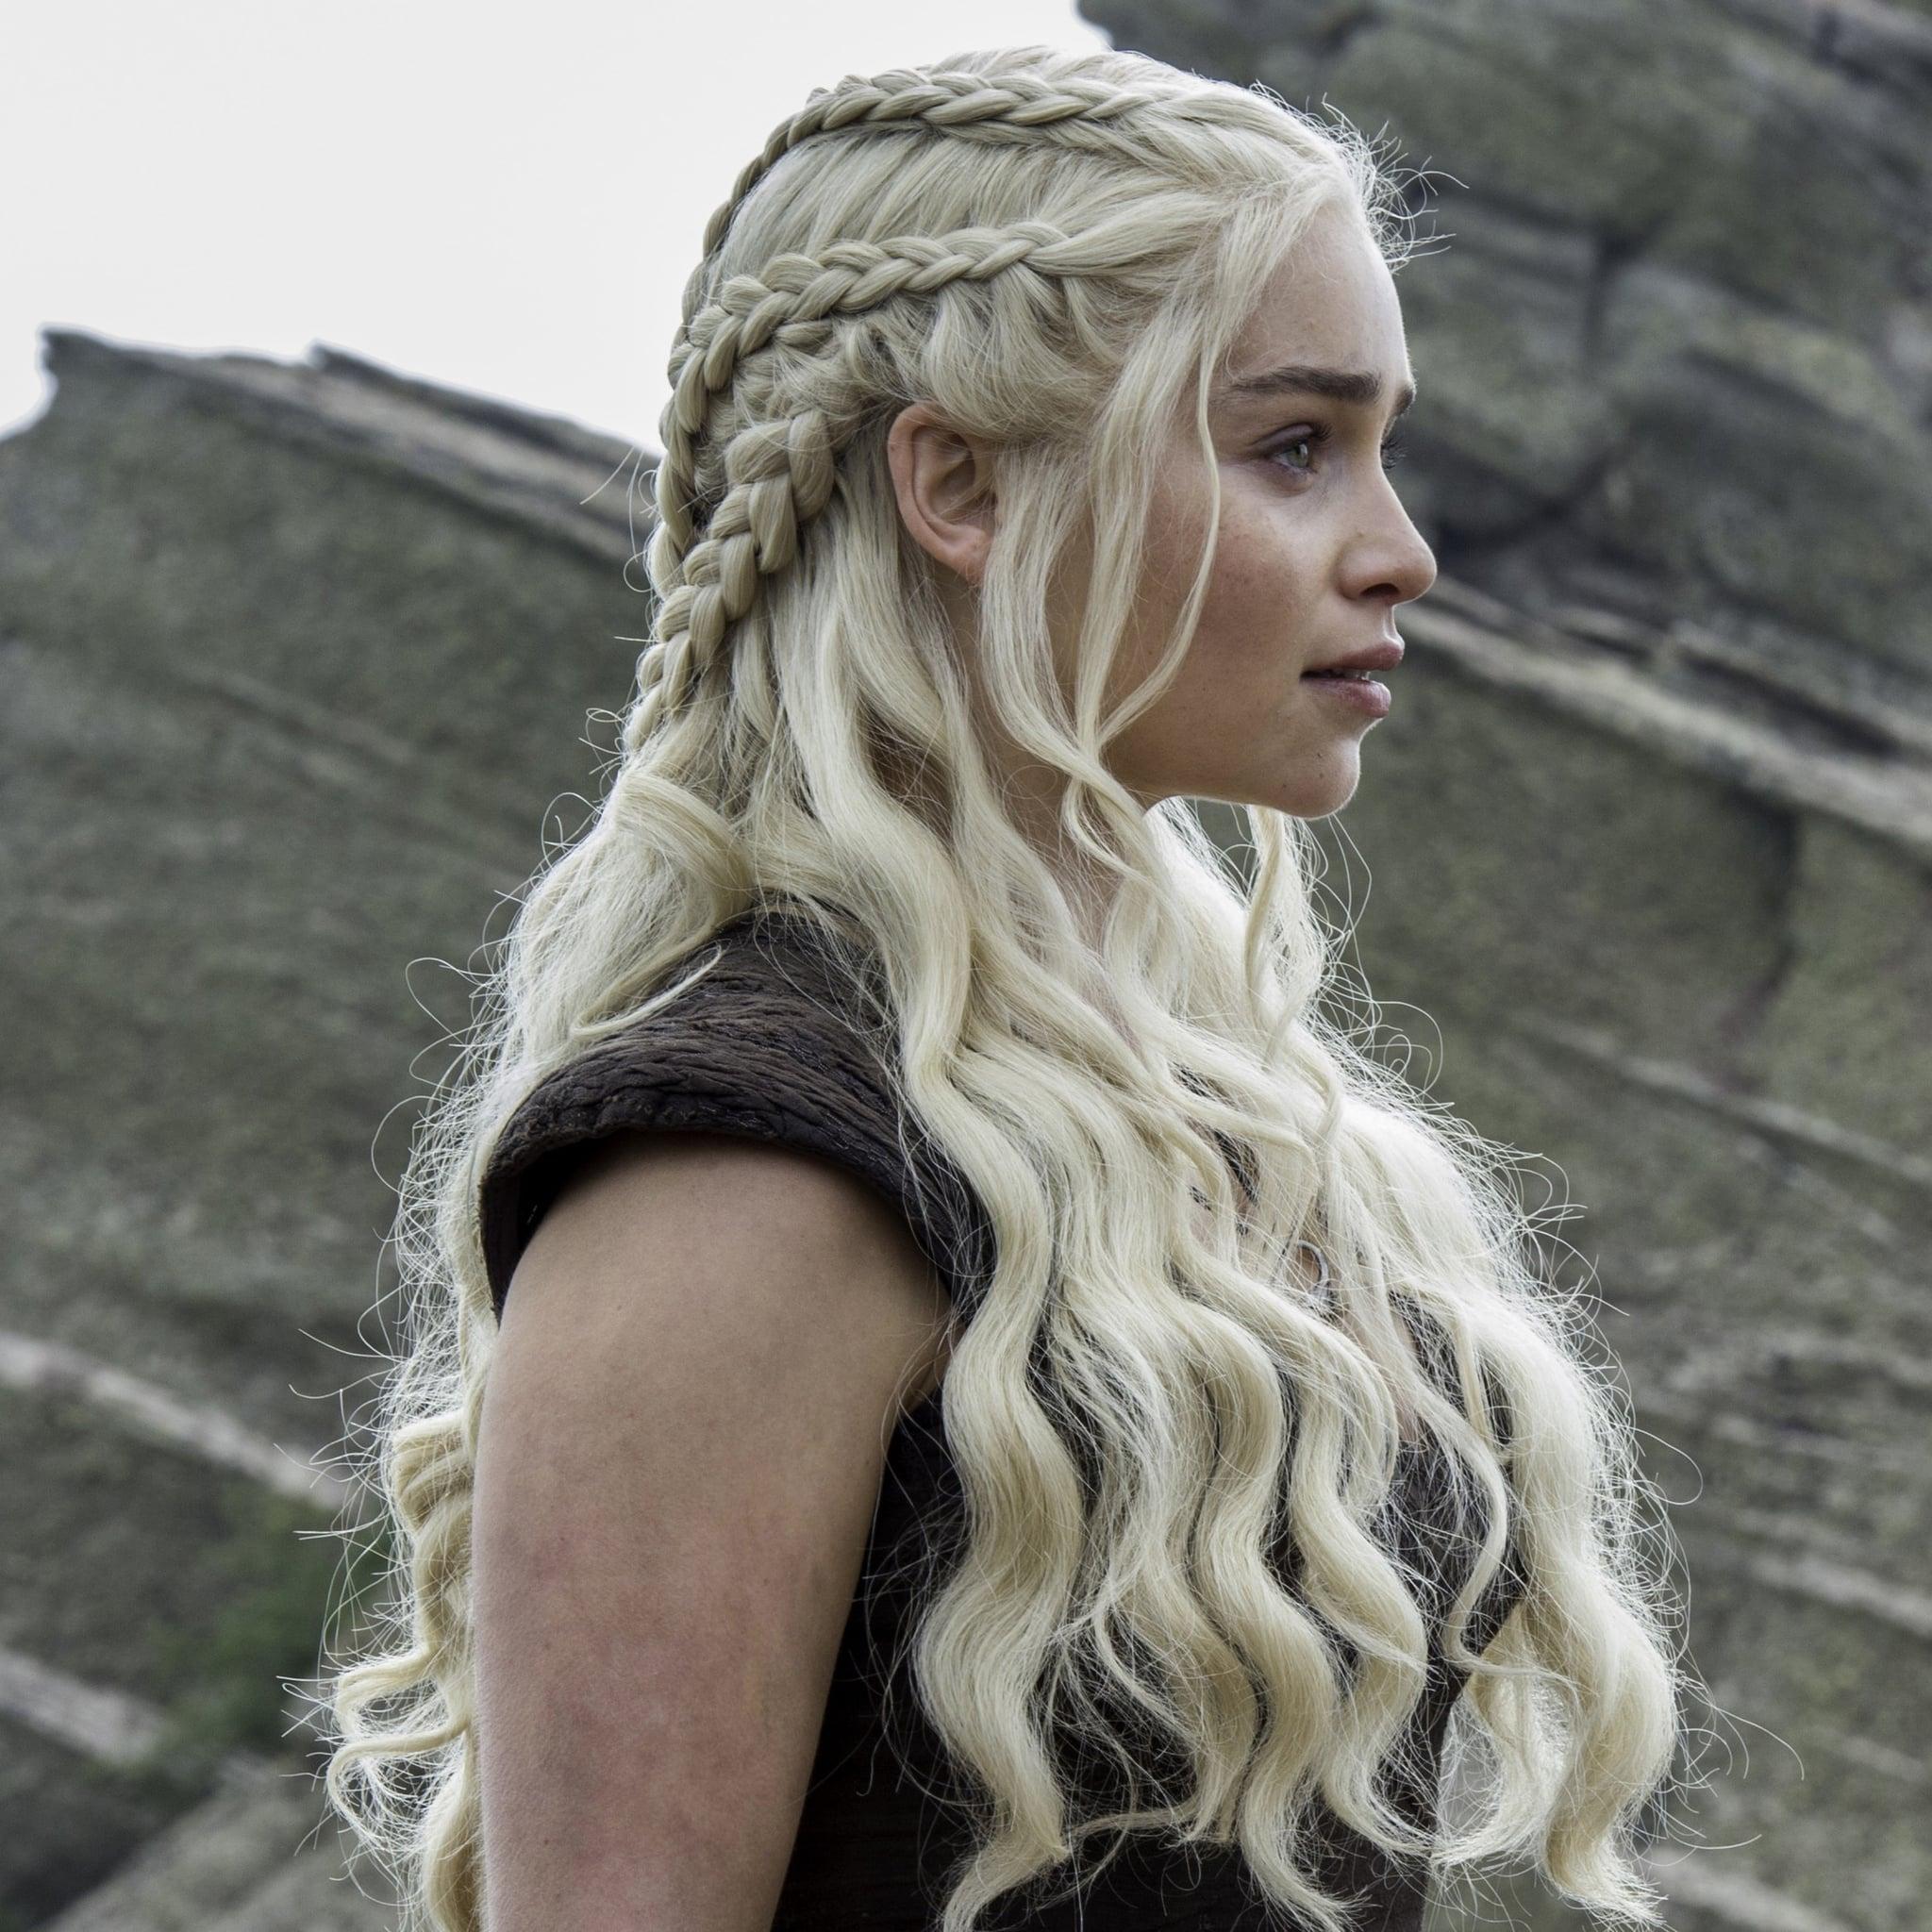 Game Of Thrones Season 7 Jon Snow And Daenerys Theories